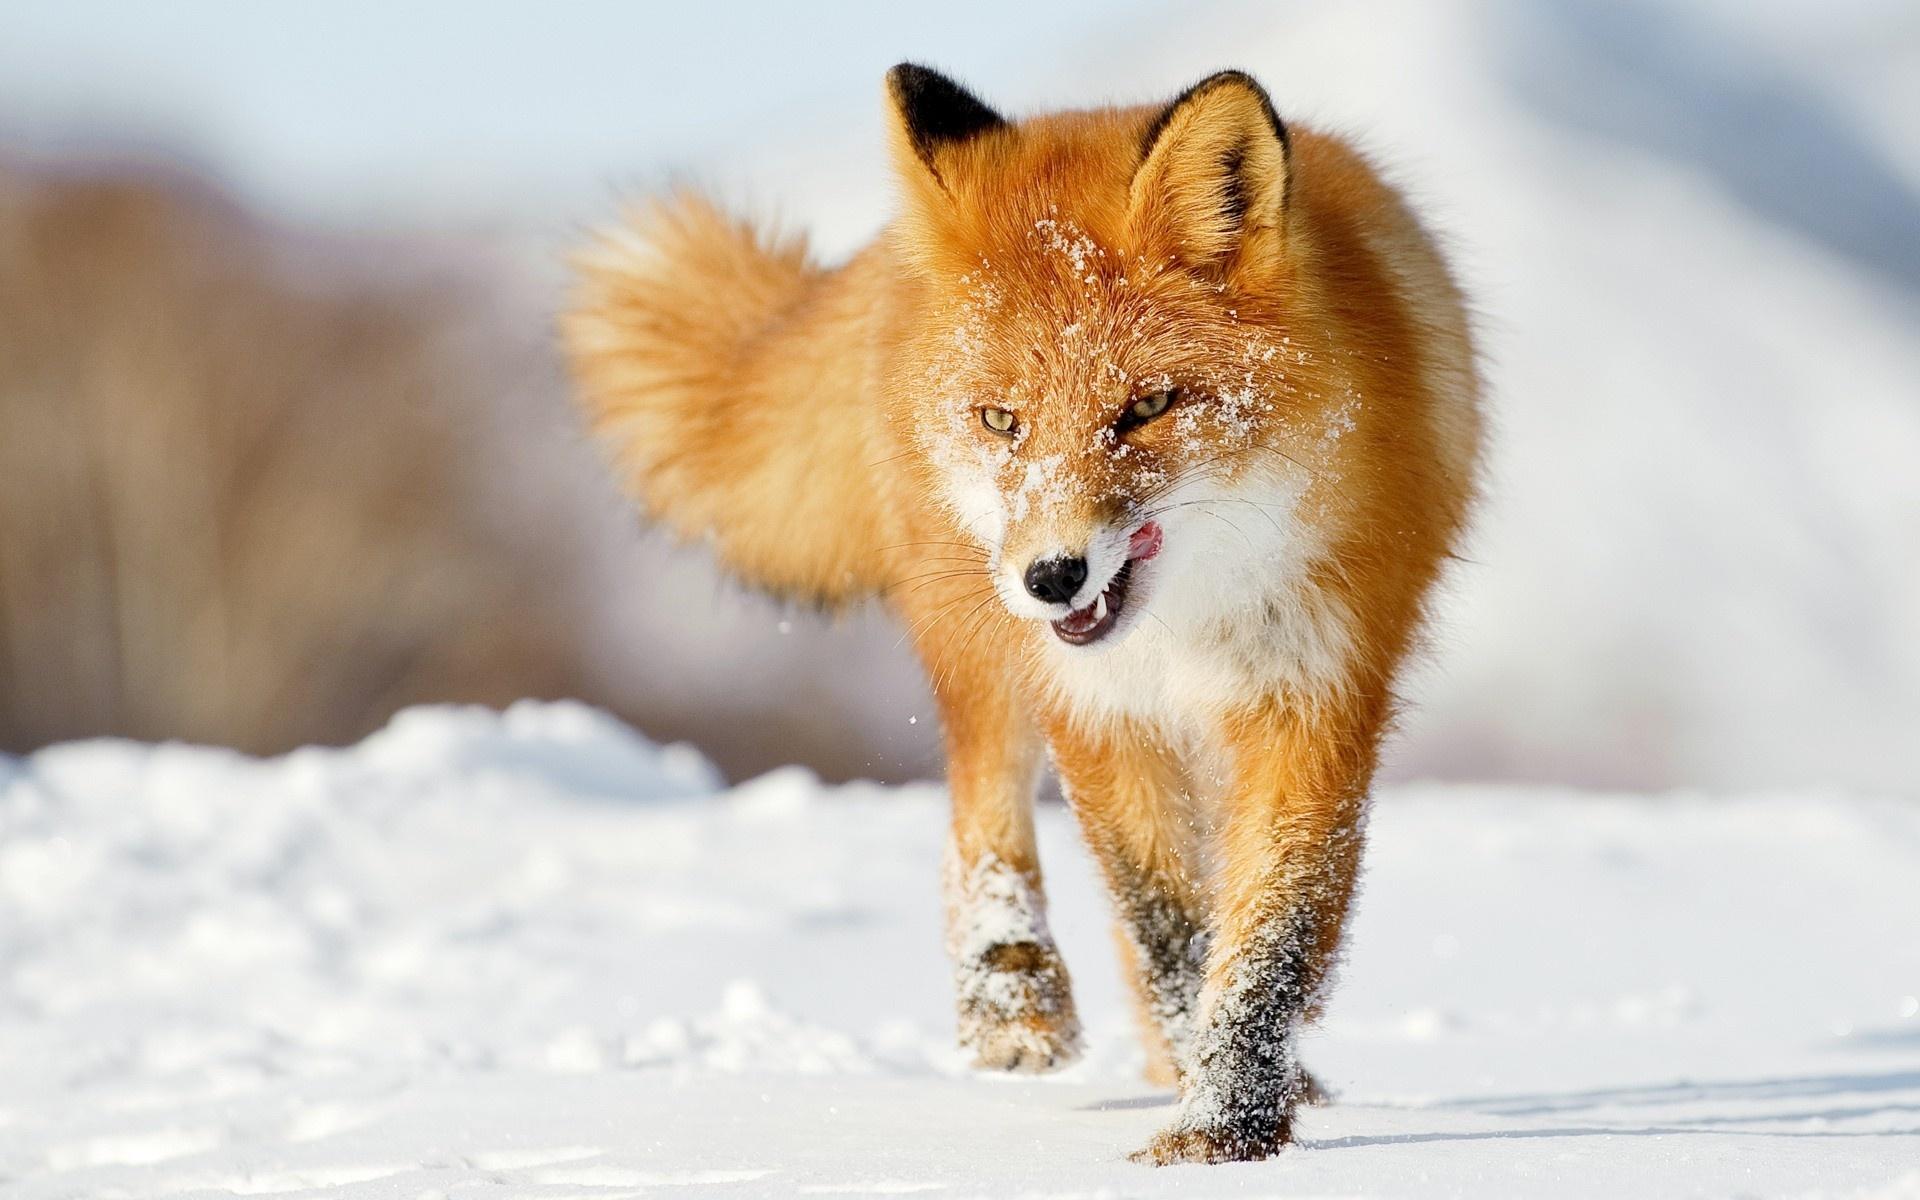 Wallpapers Of Fox Snowfall On Fox Photo 25064